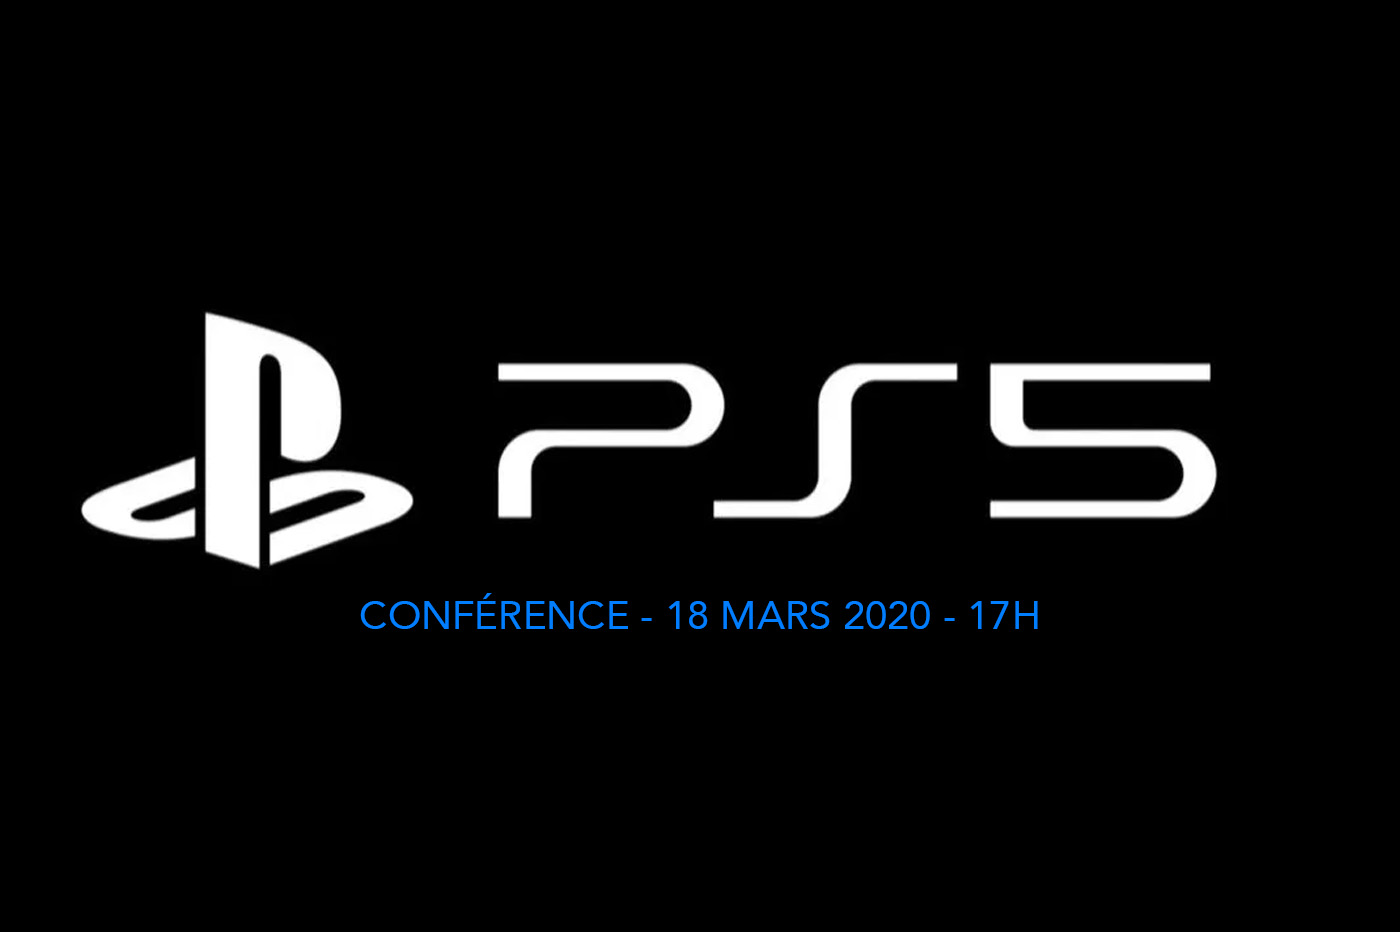 Conférence PS5 / PlayStation 5